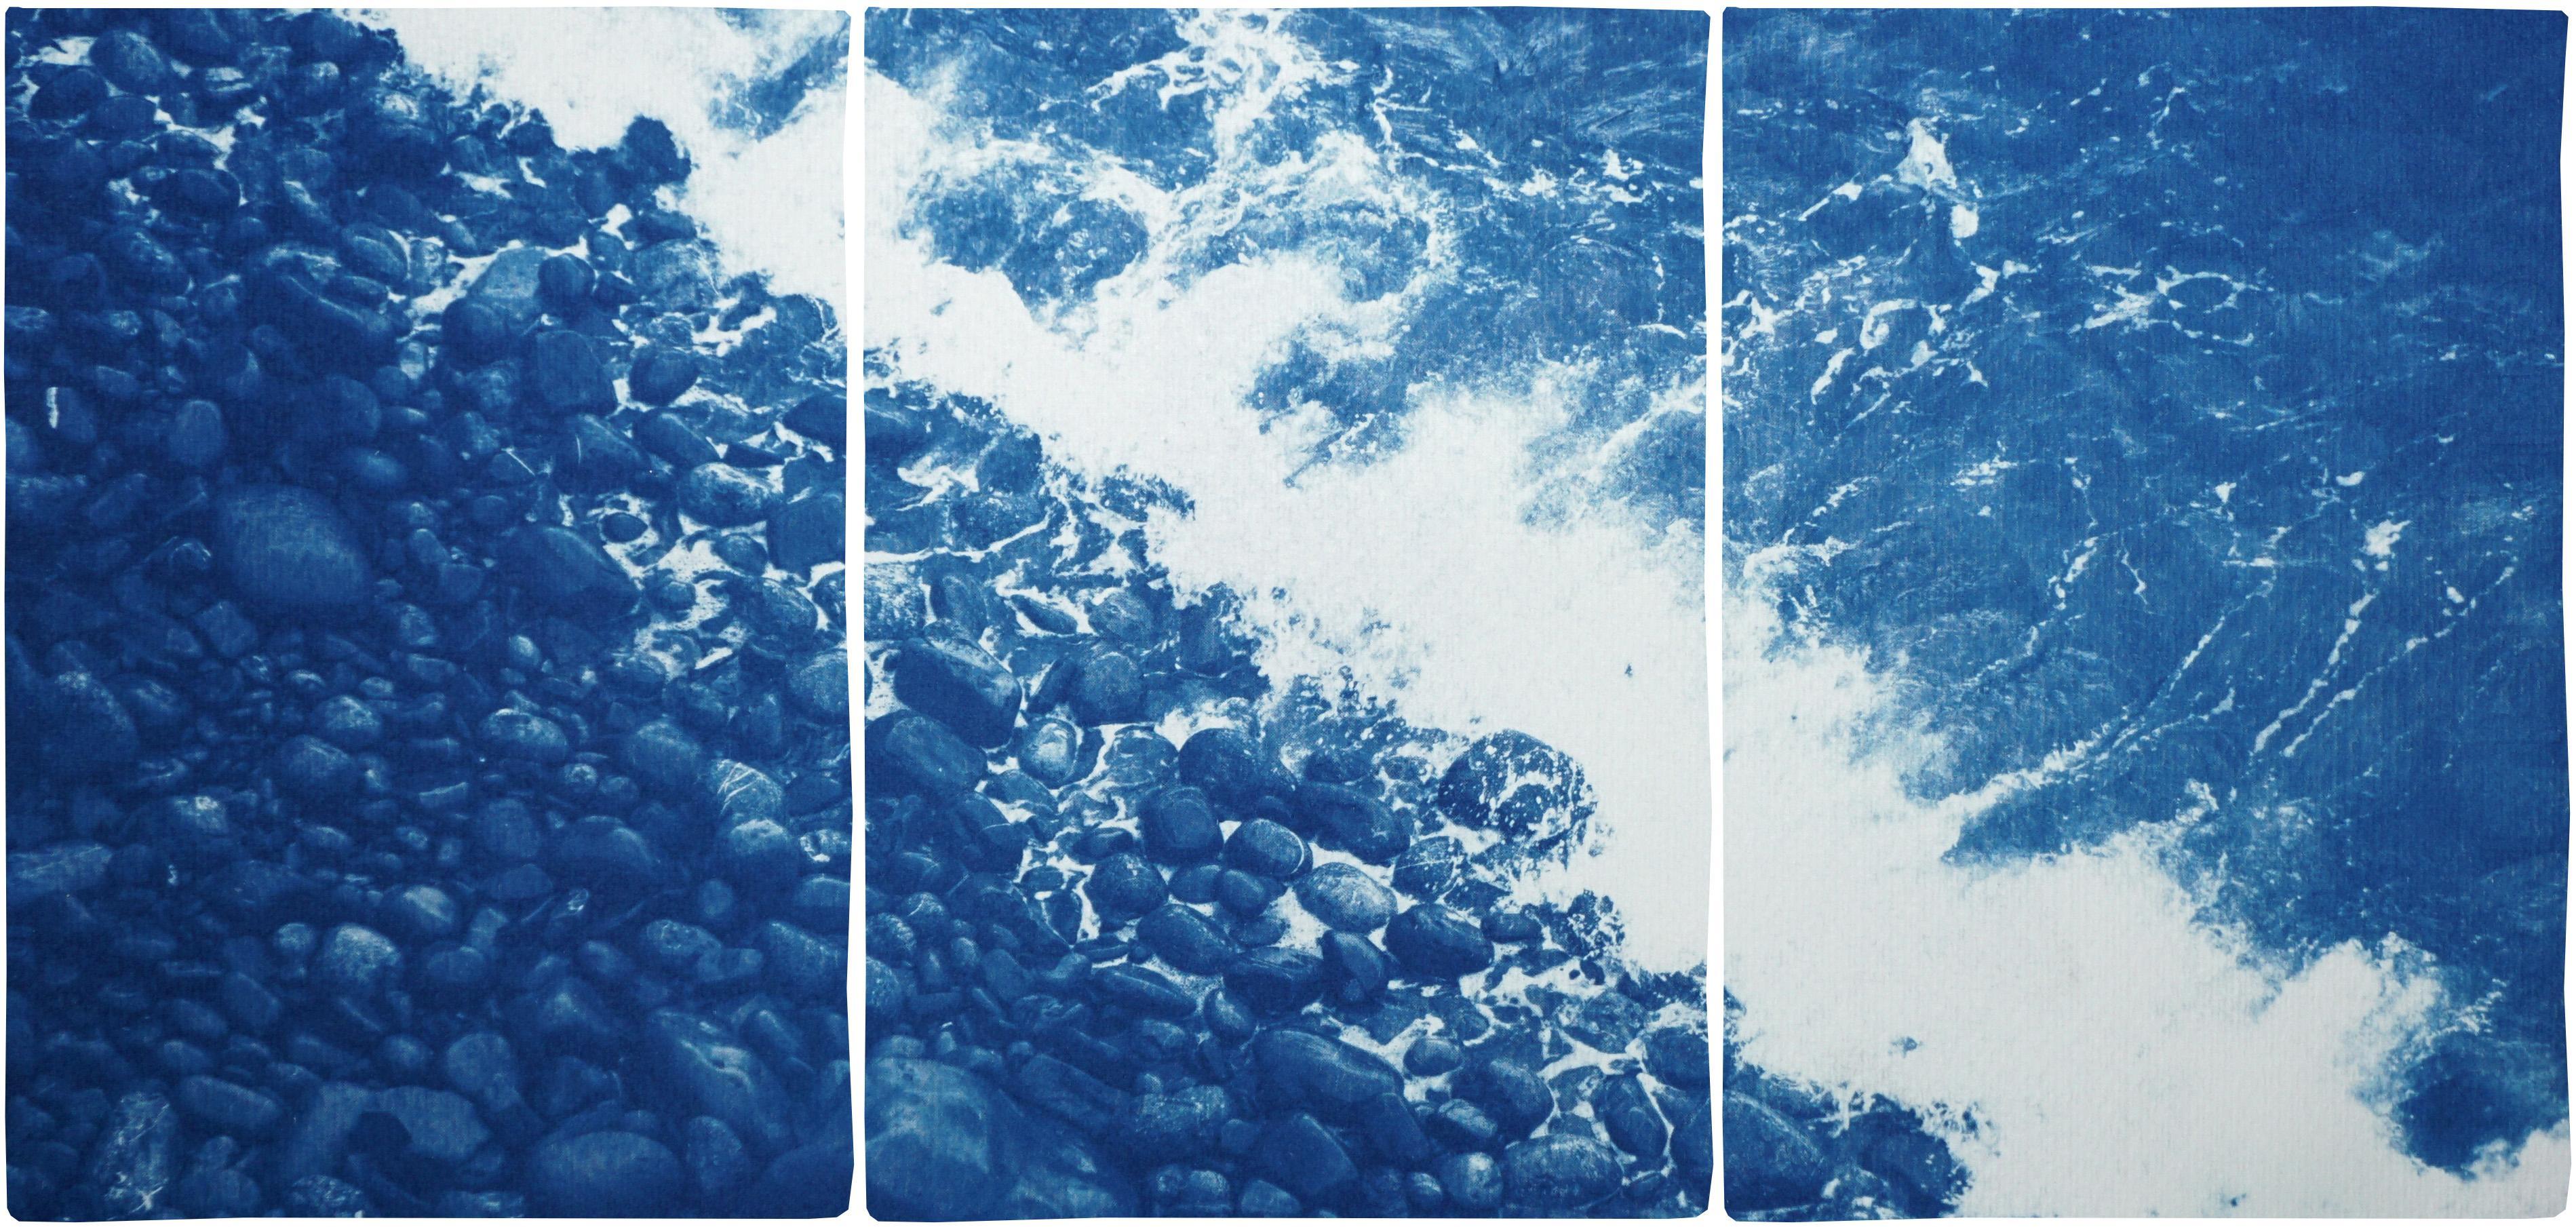 Nautical Triptych of British Pebble Beach, Handmade Cyanotype, Watercolor Paper